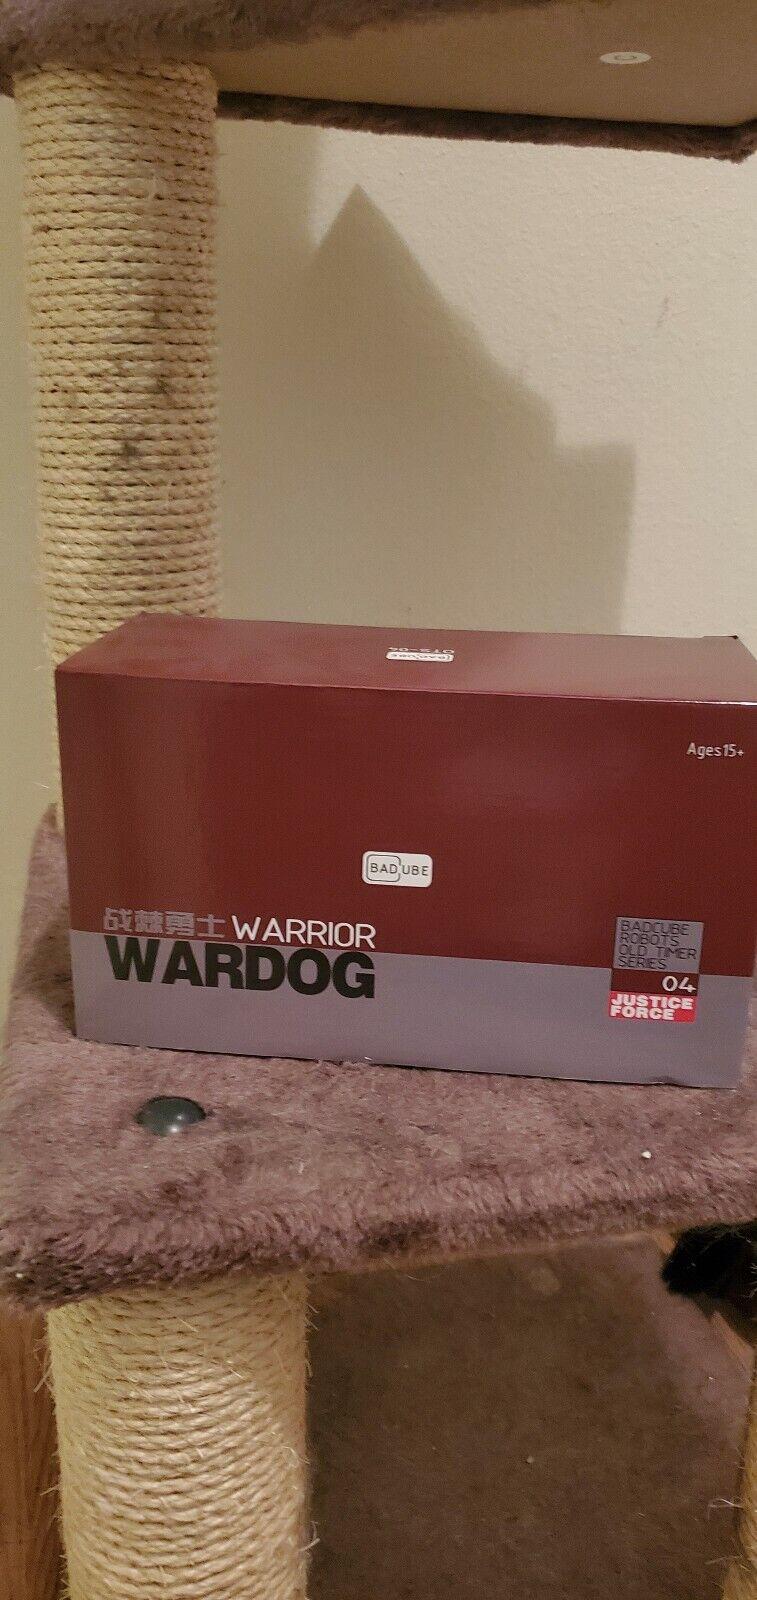 Badcube OTS04 WARDOG MITRAGLIATRICI piede di guerra Transformers noi venditore